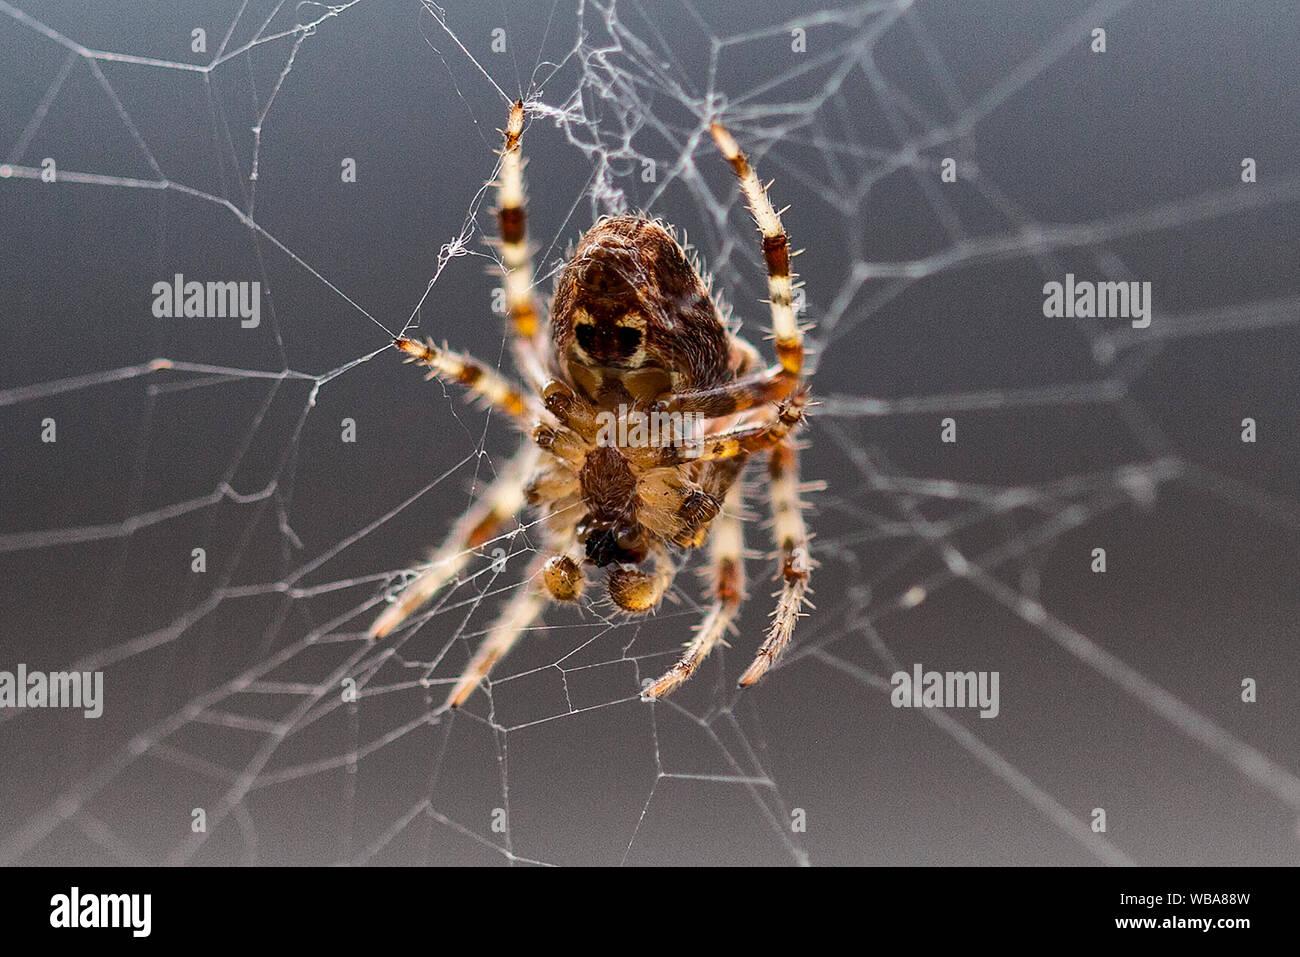 Macro close-up photos of spider arachnid in a cobweb web spiderweb trapping prey Stock Photo